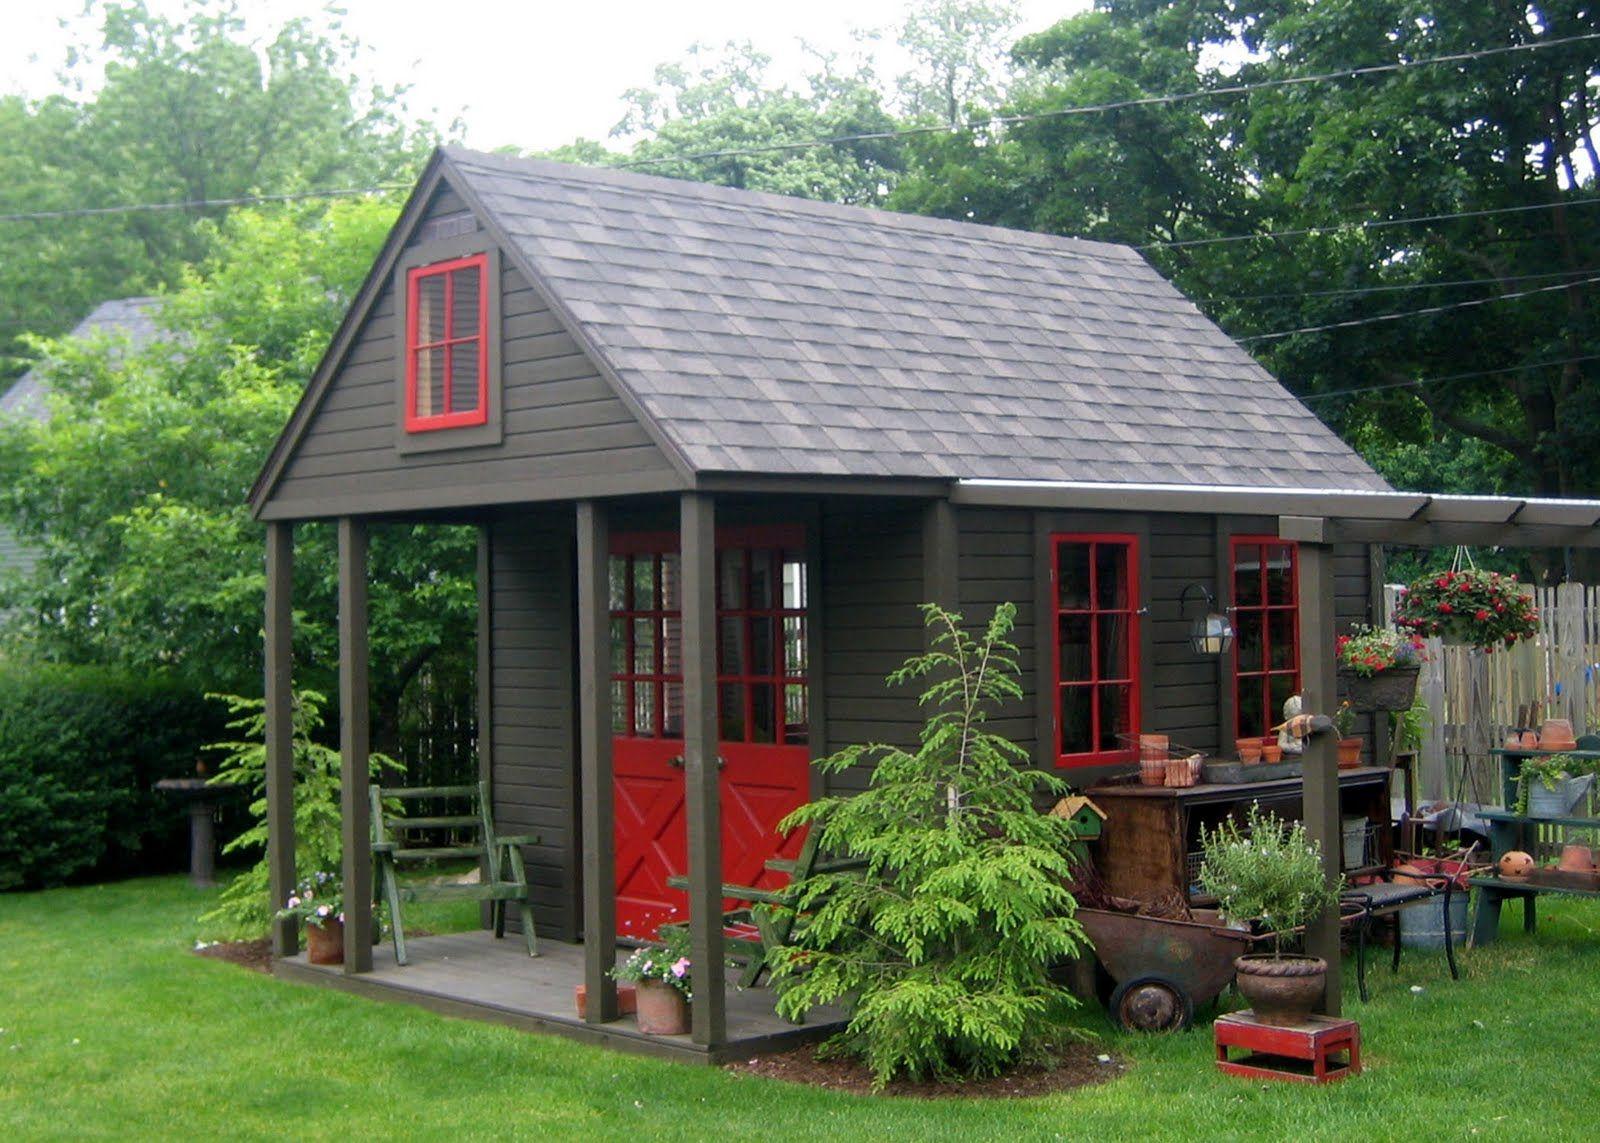 Wonderful Home And Garden Club: GARDEN SHEDS, PORCHES,